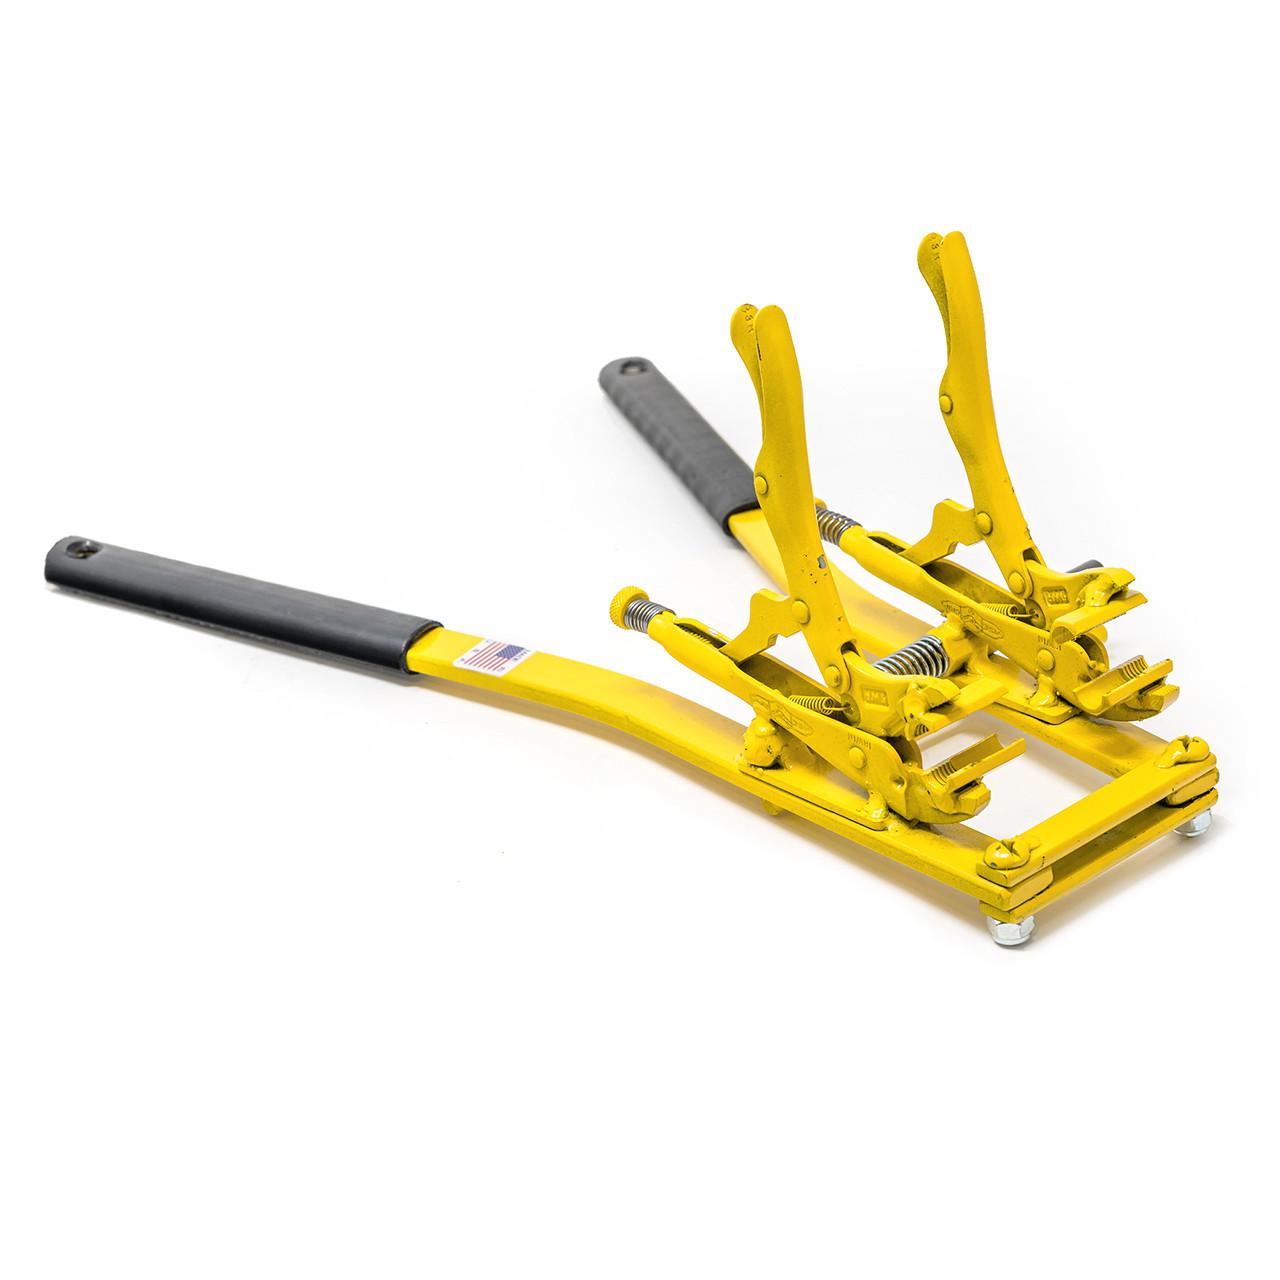 Two- Hand Tubing Tool